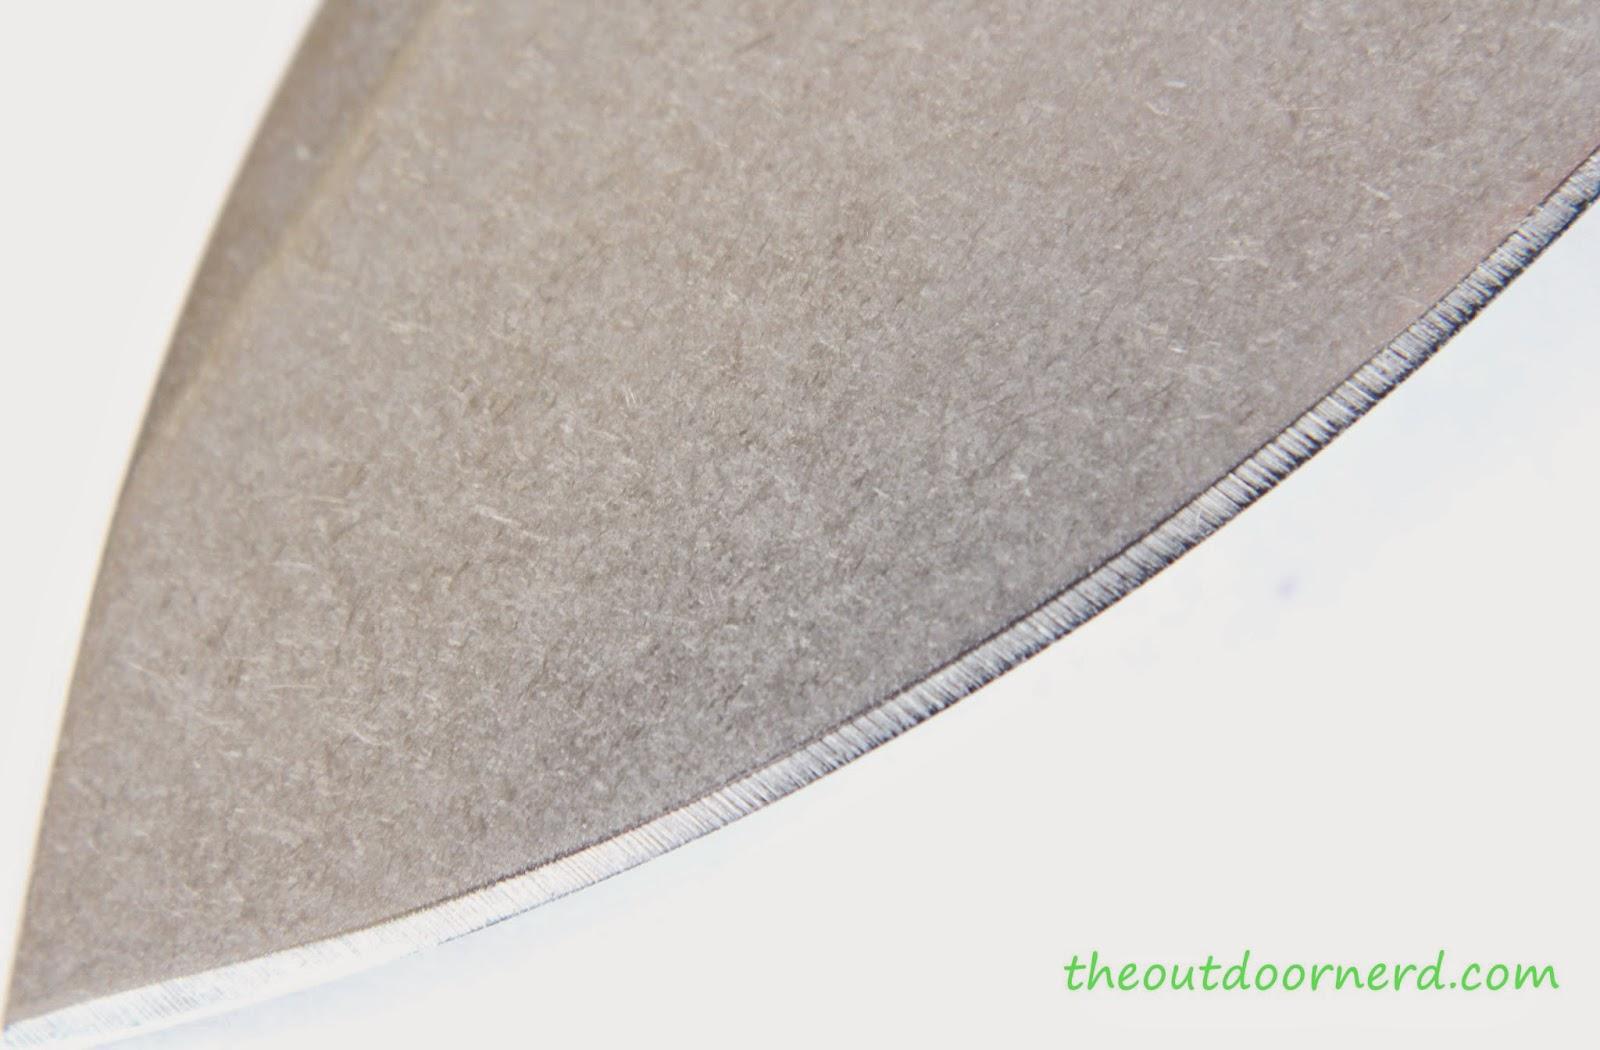 Kershaw Swerve EDC Pocket Knife:  View Of Blade - Tip